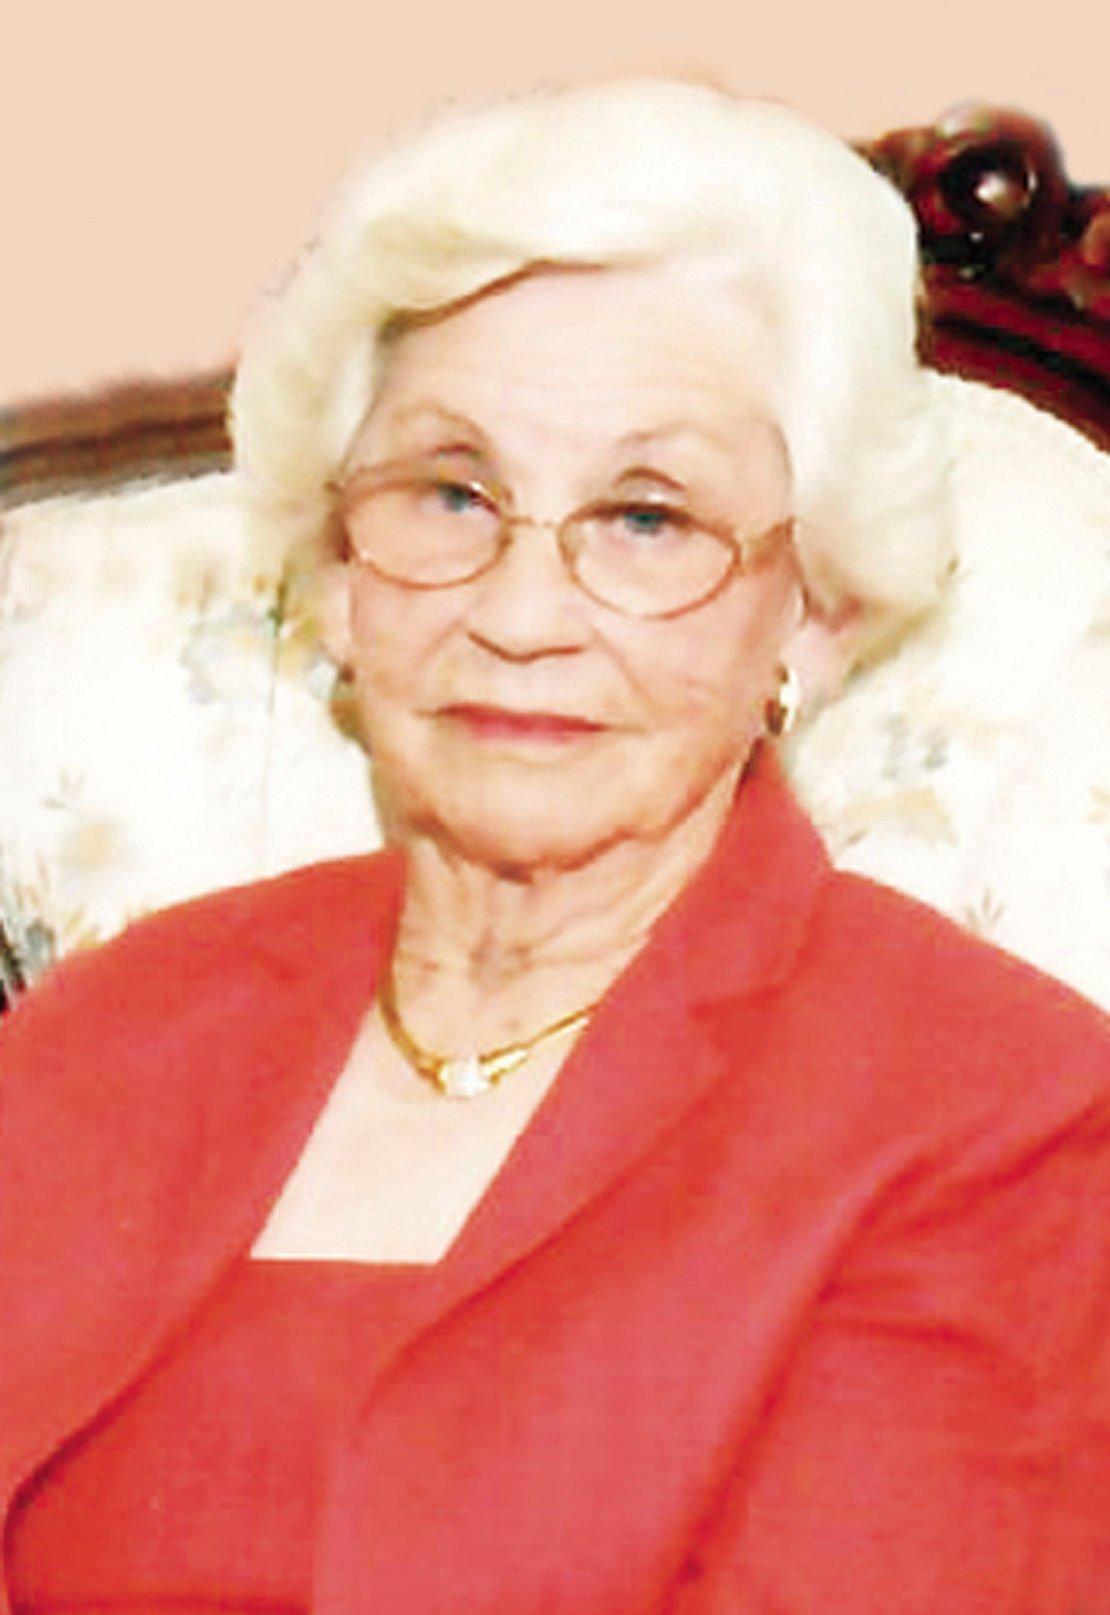 Longevity isn't a secret  for Centenarian Polly Wall